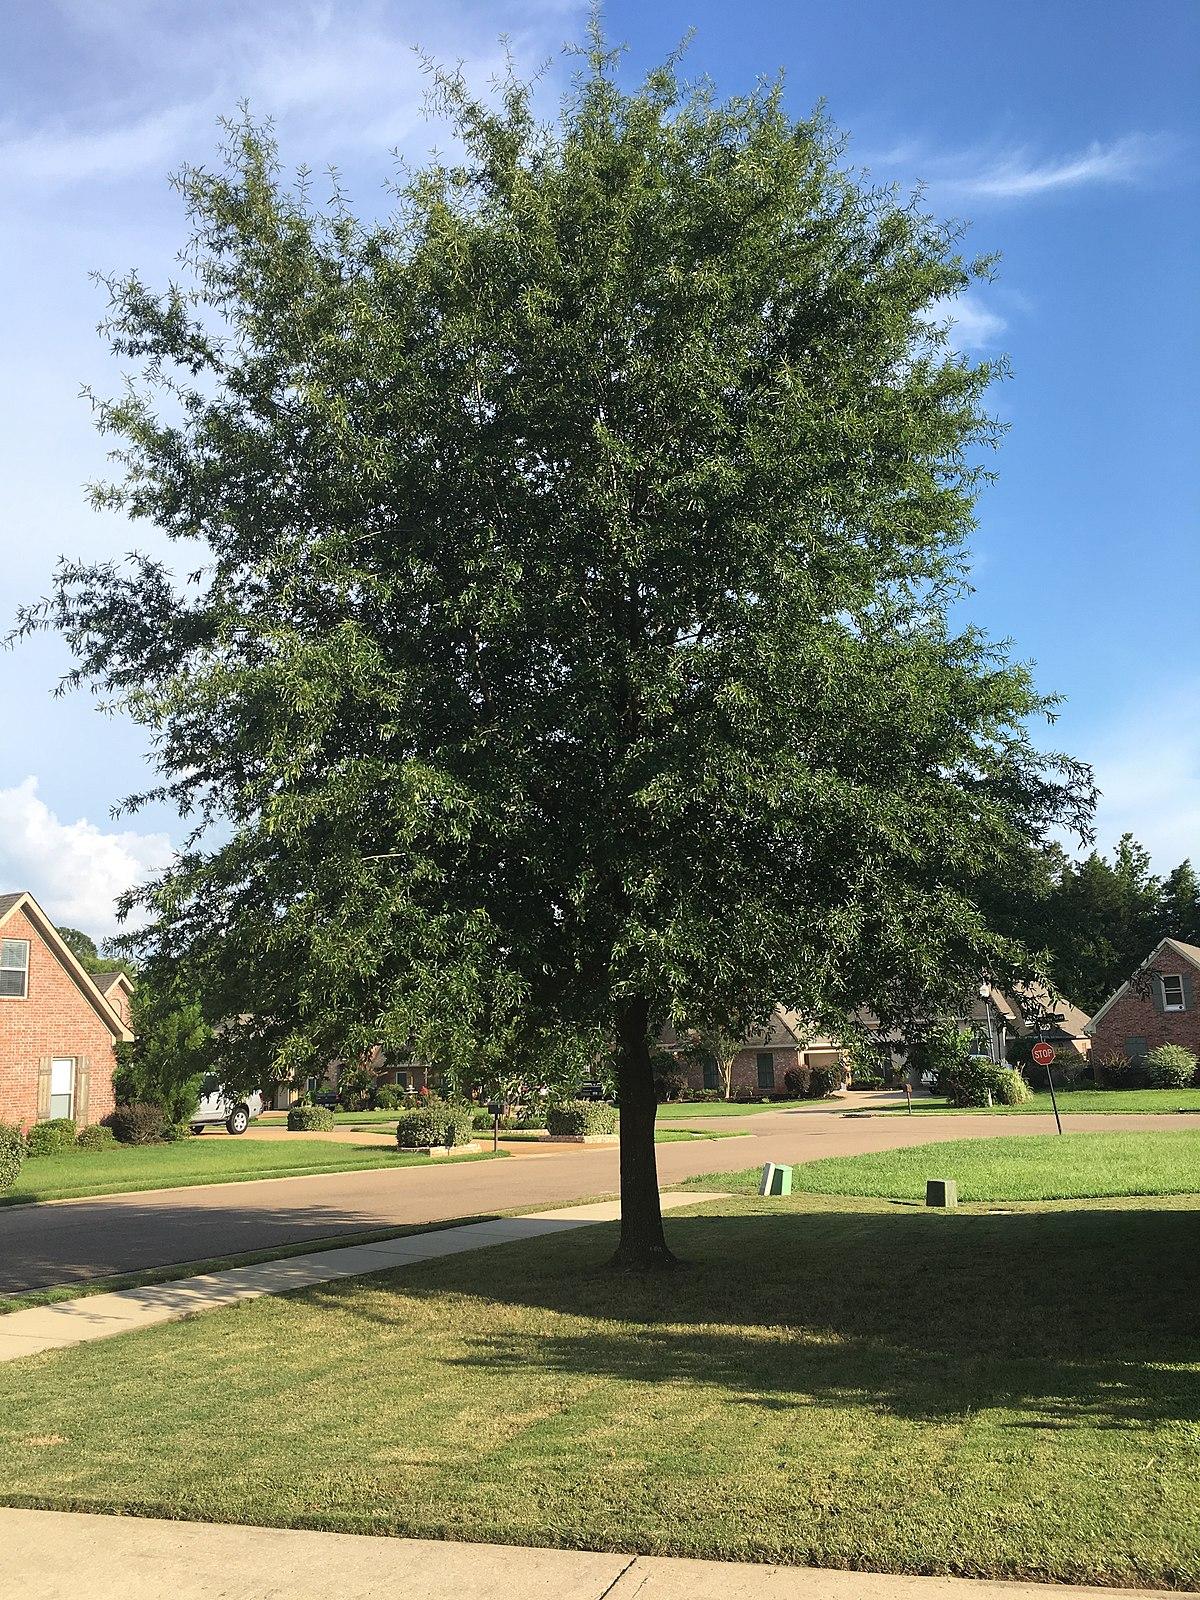 Rye: 105 properties found